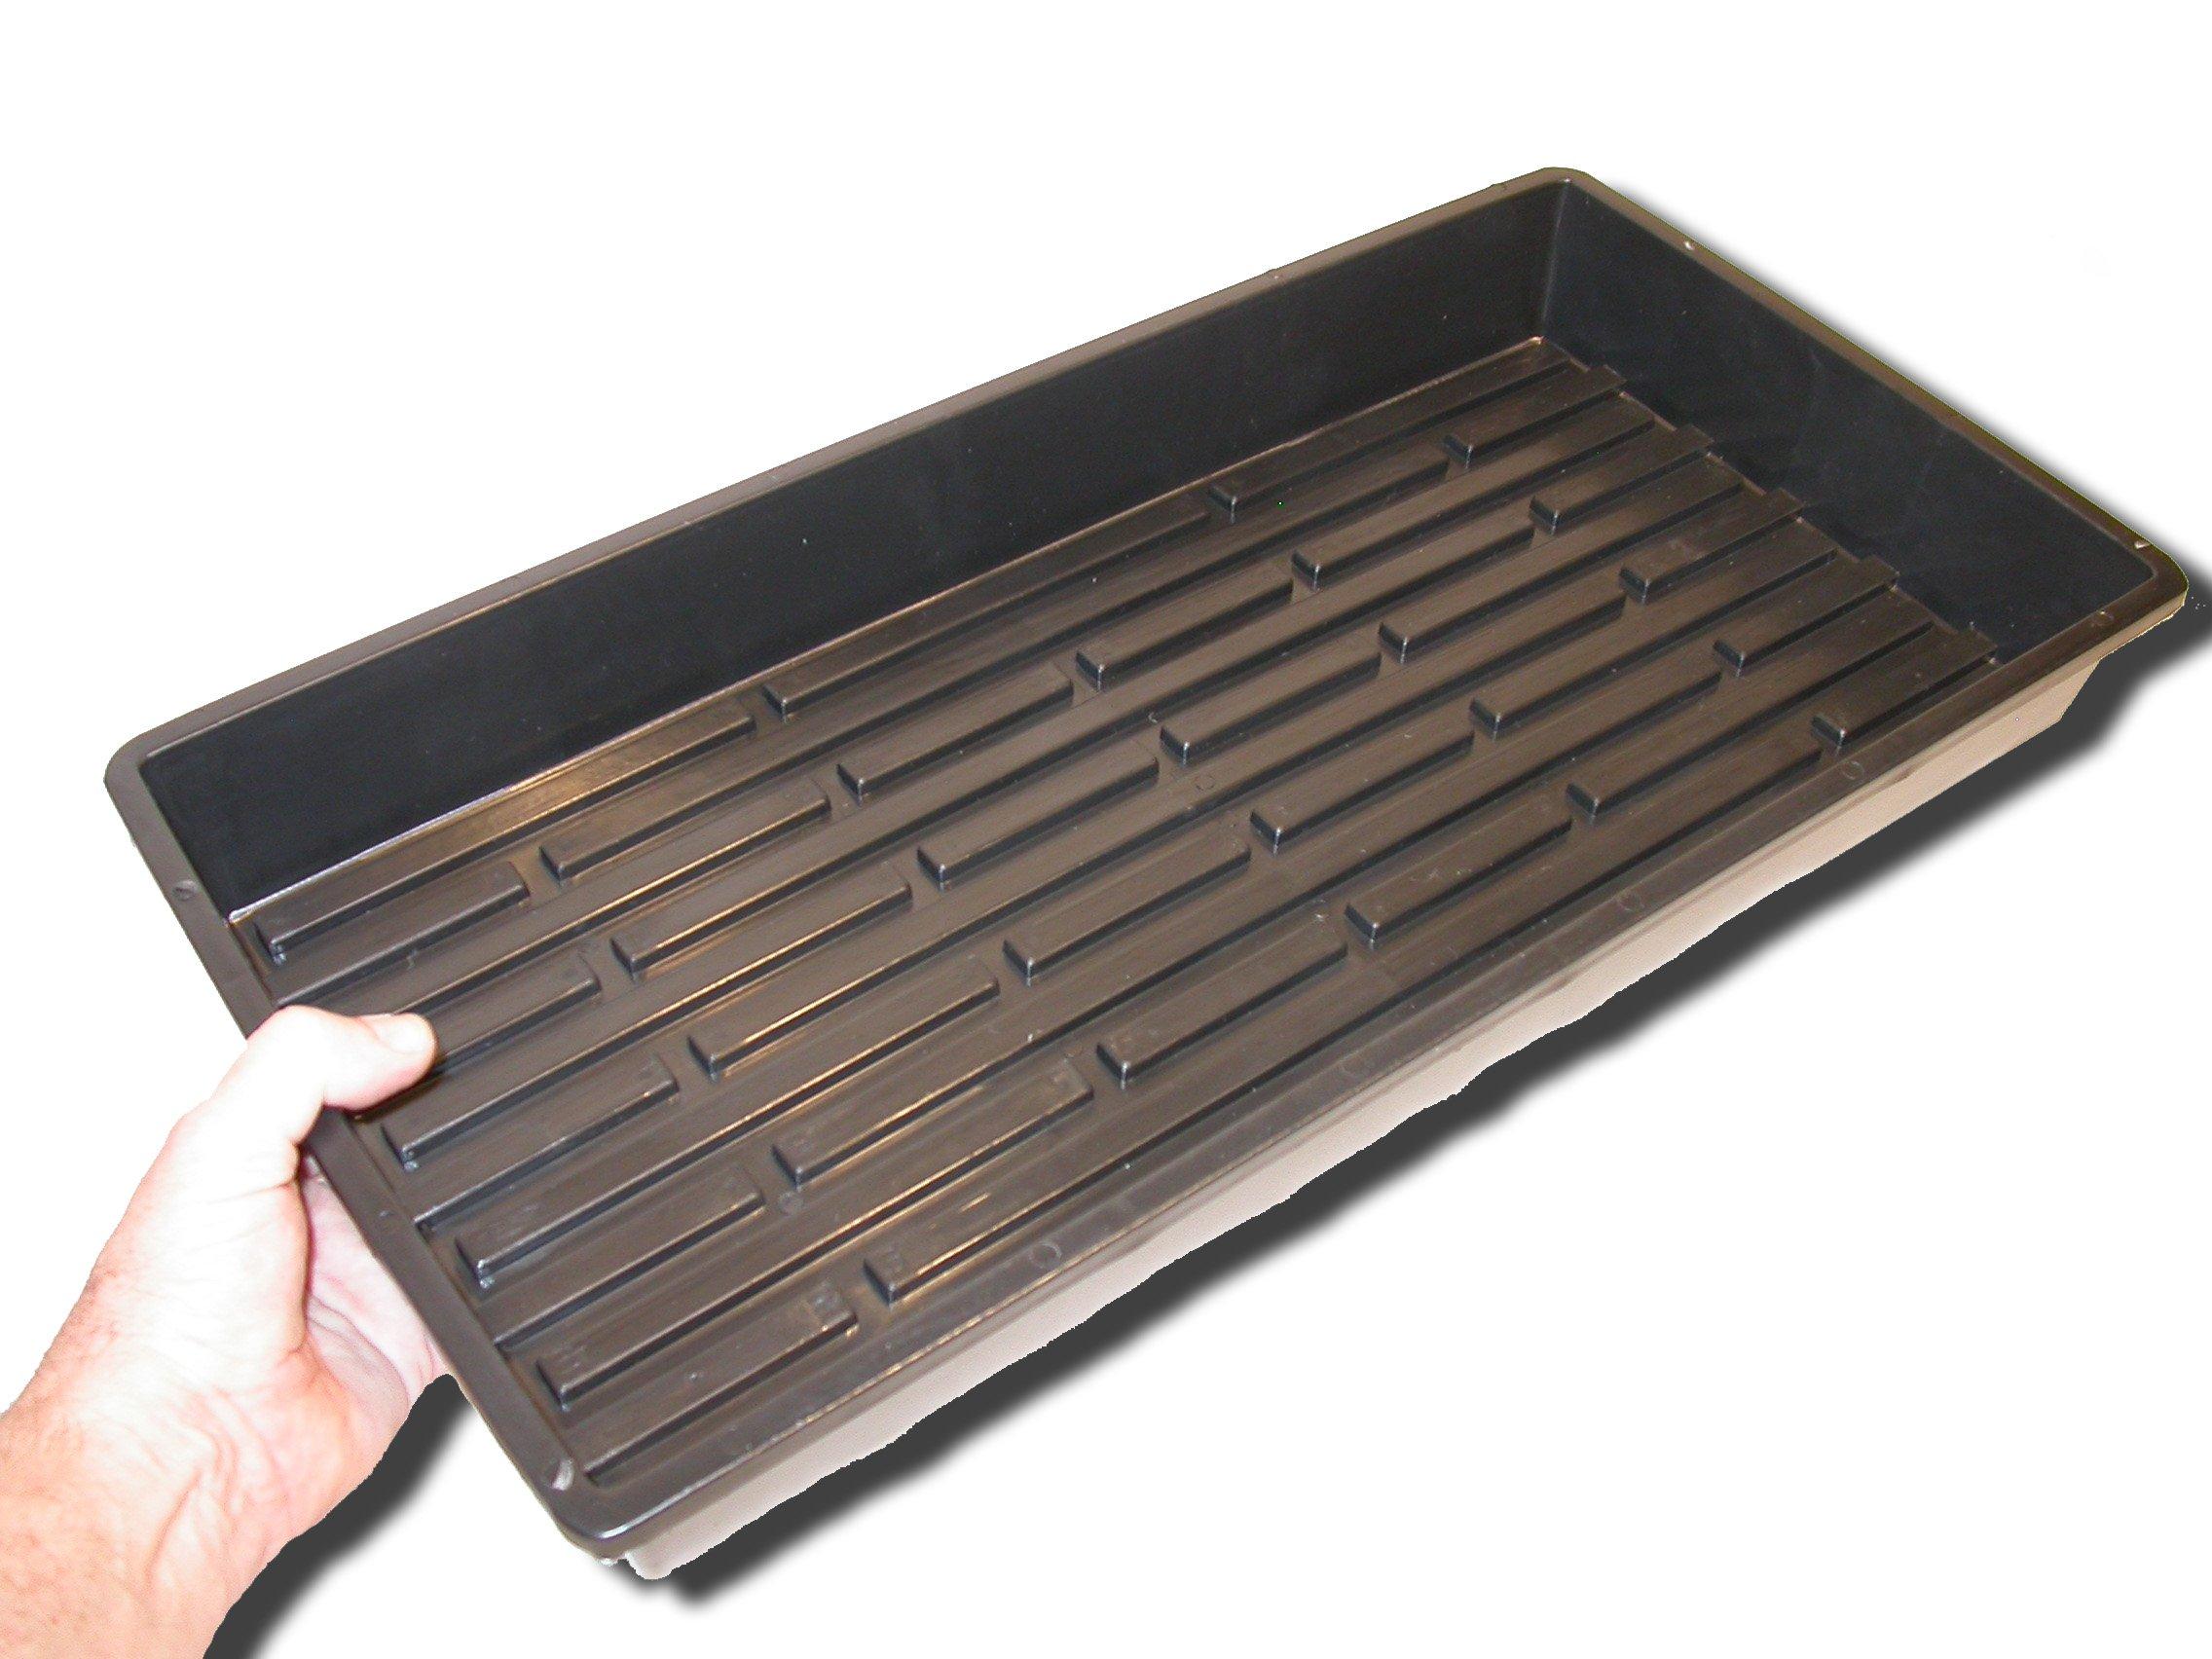 Sun Blaster 1400235 1020 Black Quad Thick Tray